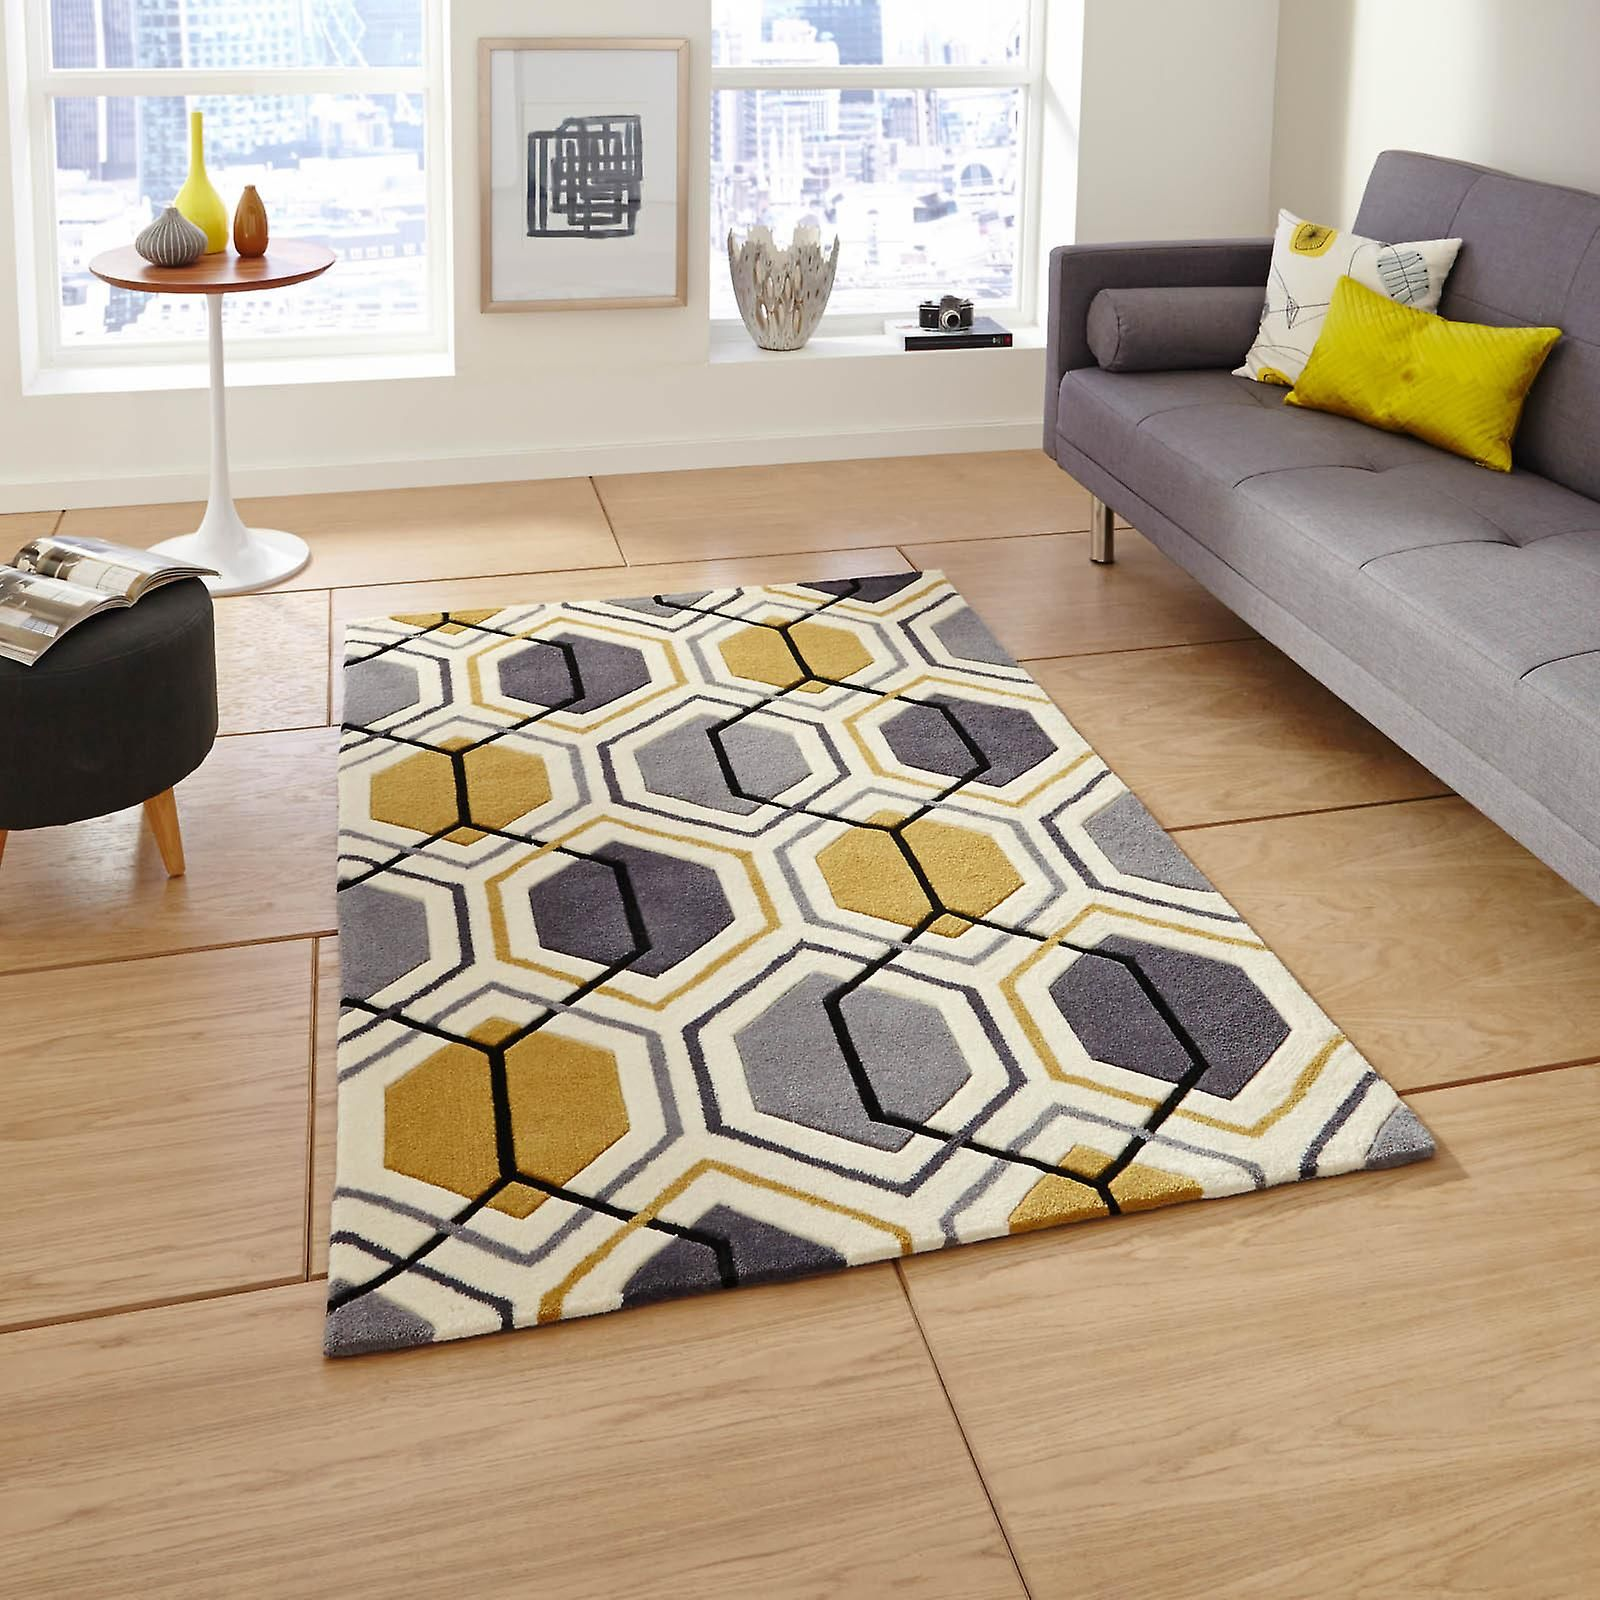 Hong Kong Hk 7526 tapis gris jaune | Dream Home Design | Pinterest ...